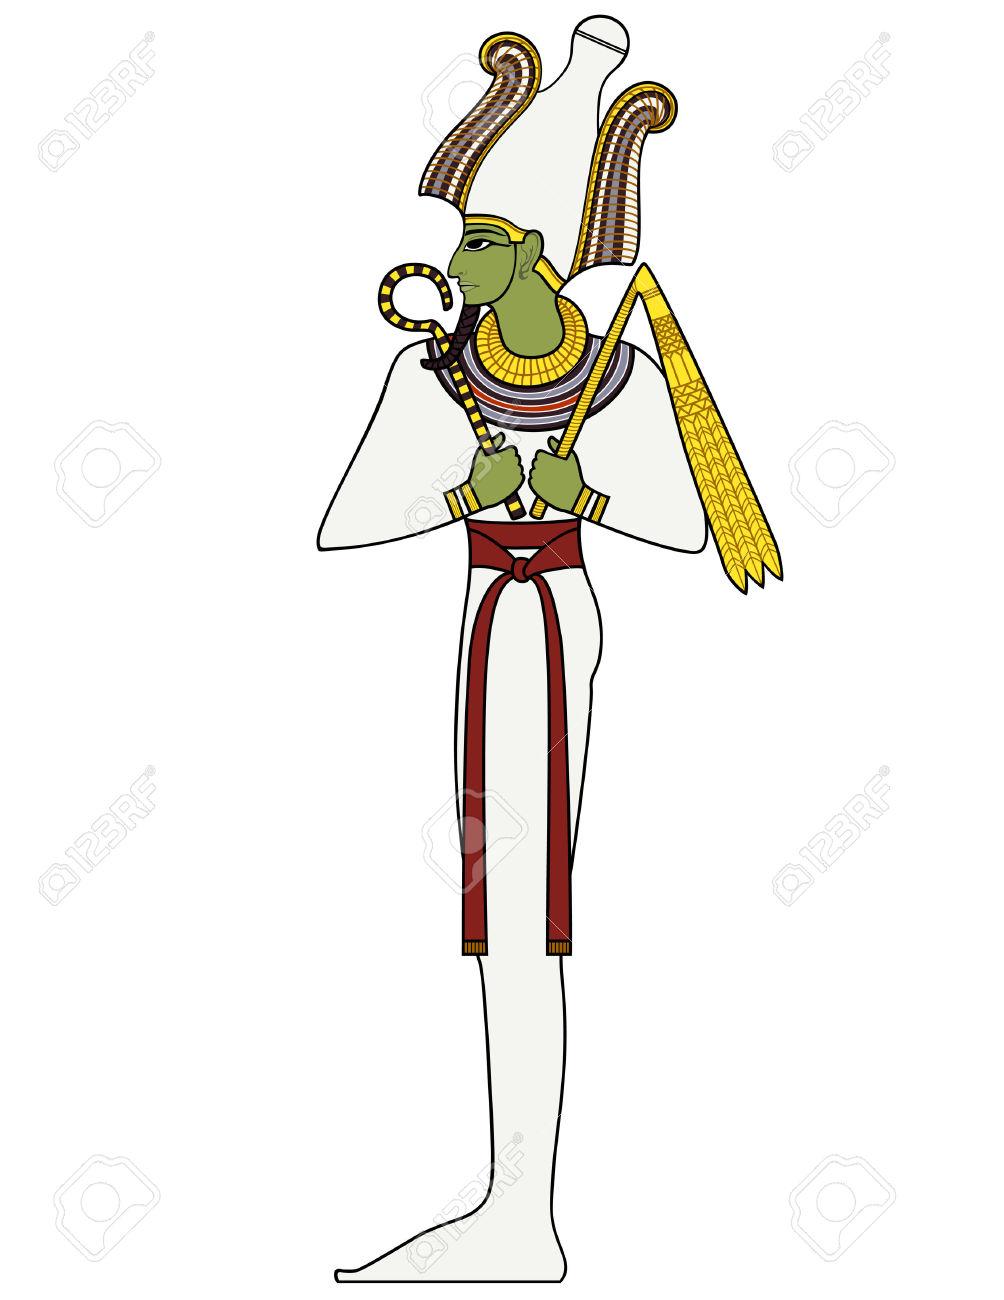 Osiris clipart #15, Download drawings